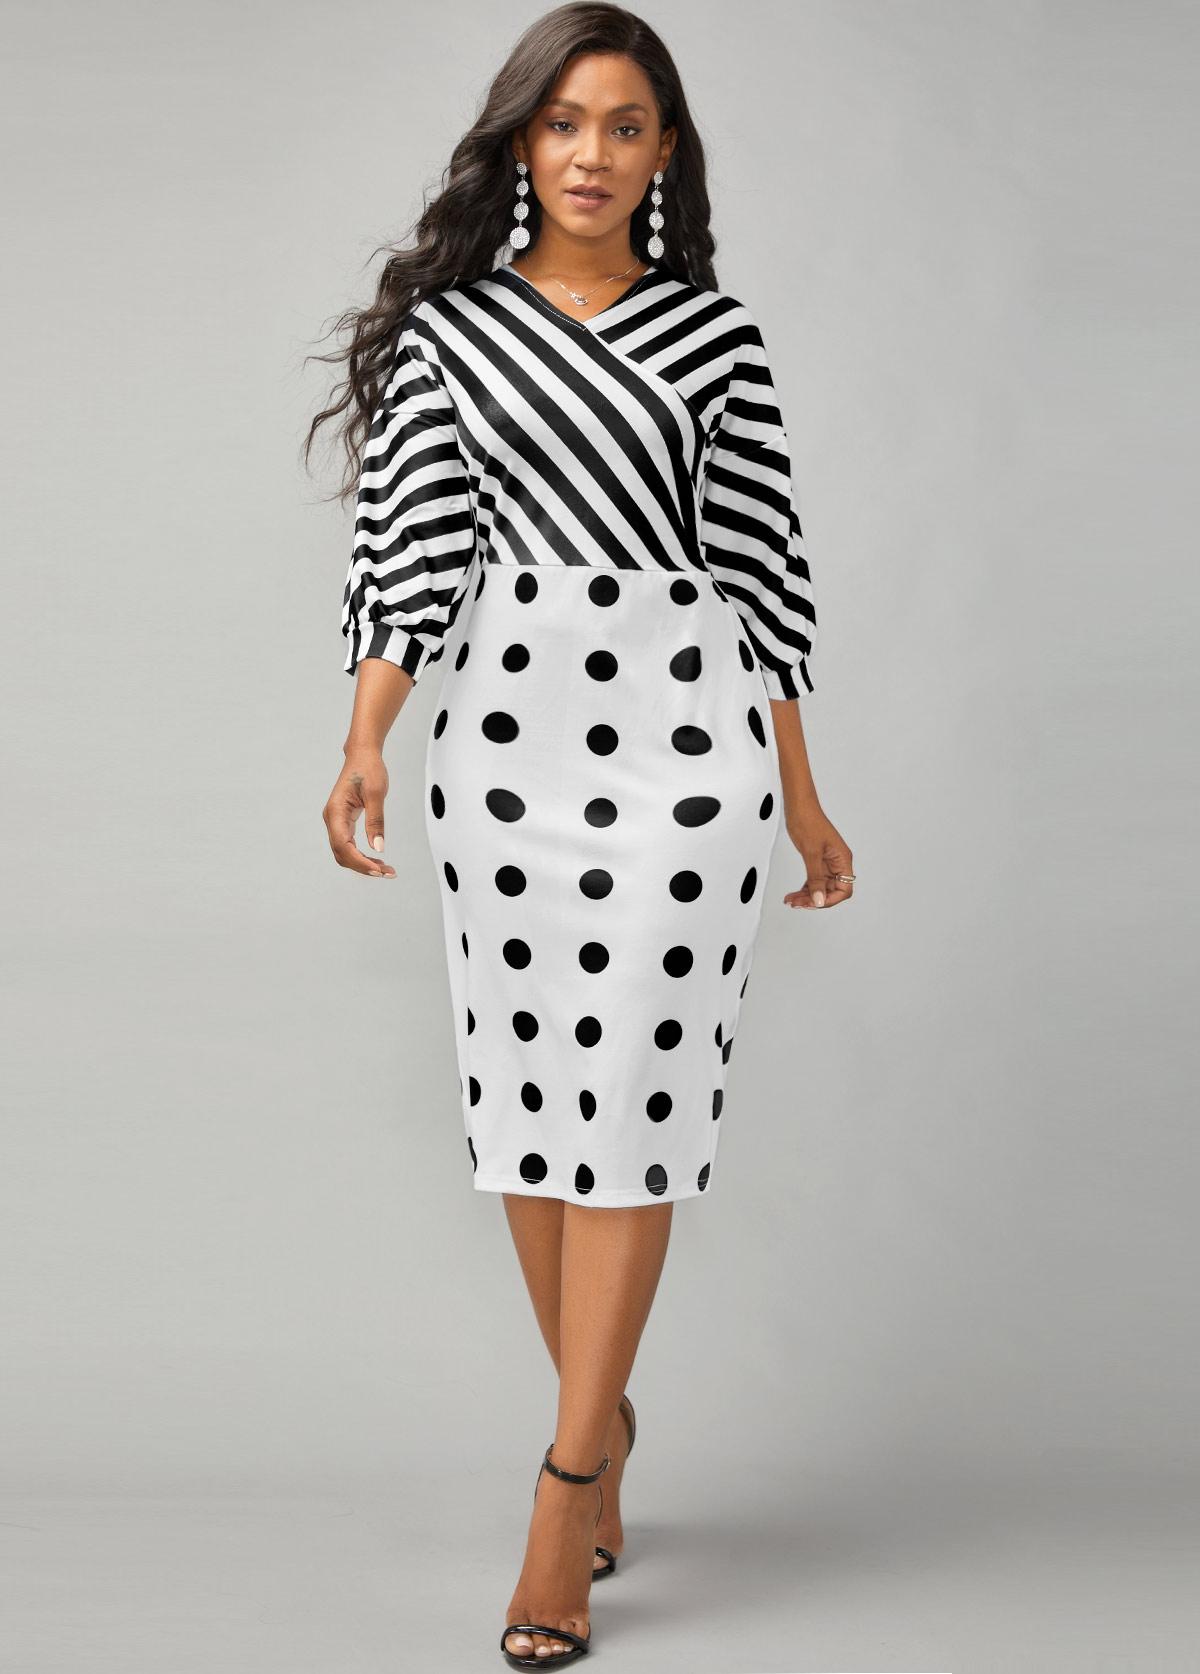 Stripe and Polka Dot Print Lantern Sleeve Dress